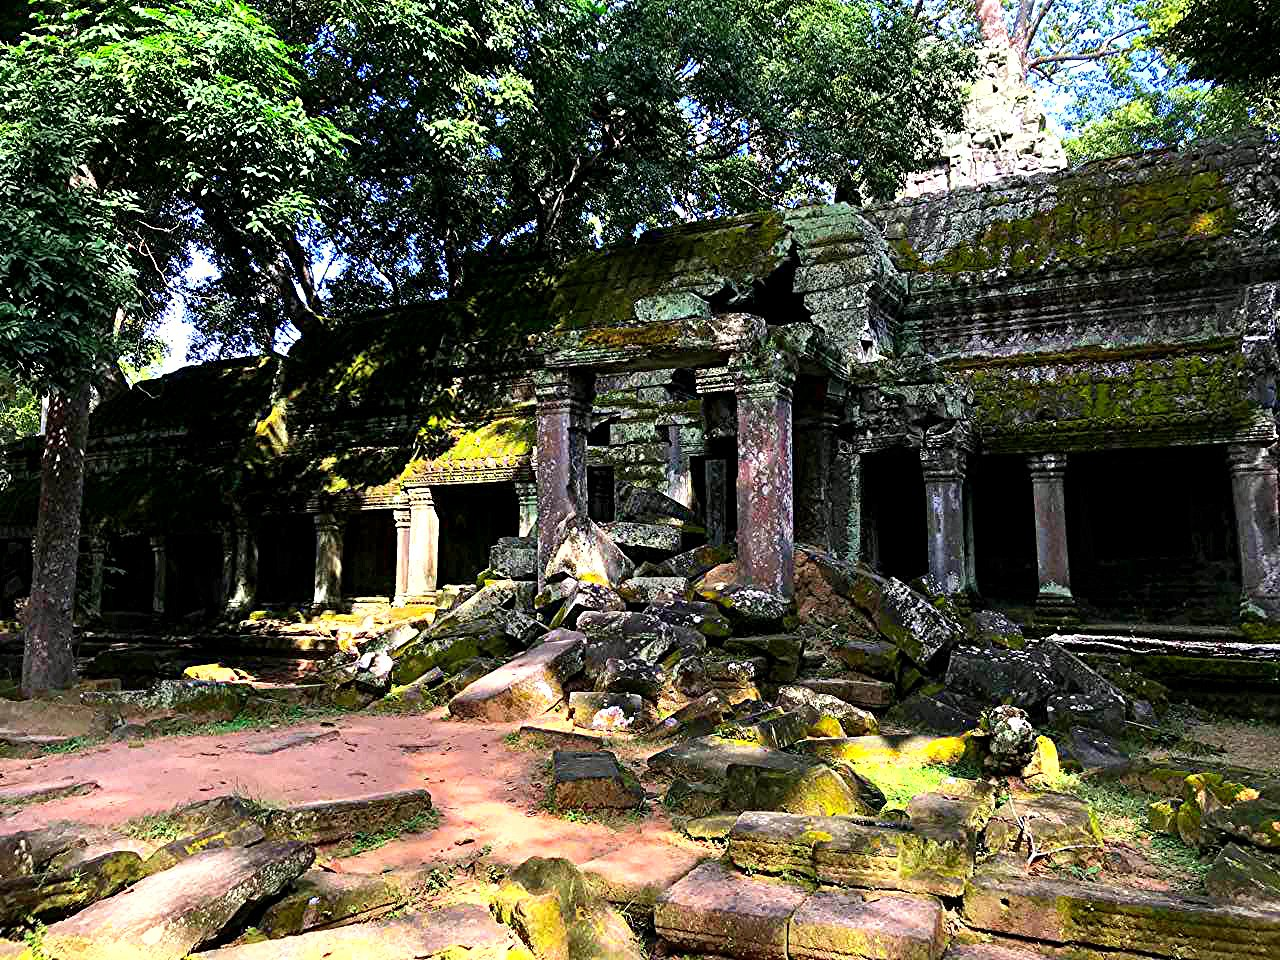 Елена Руденко (Валтея). Камбоджа. Ангкор. P8wyaiaefL4